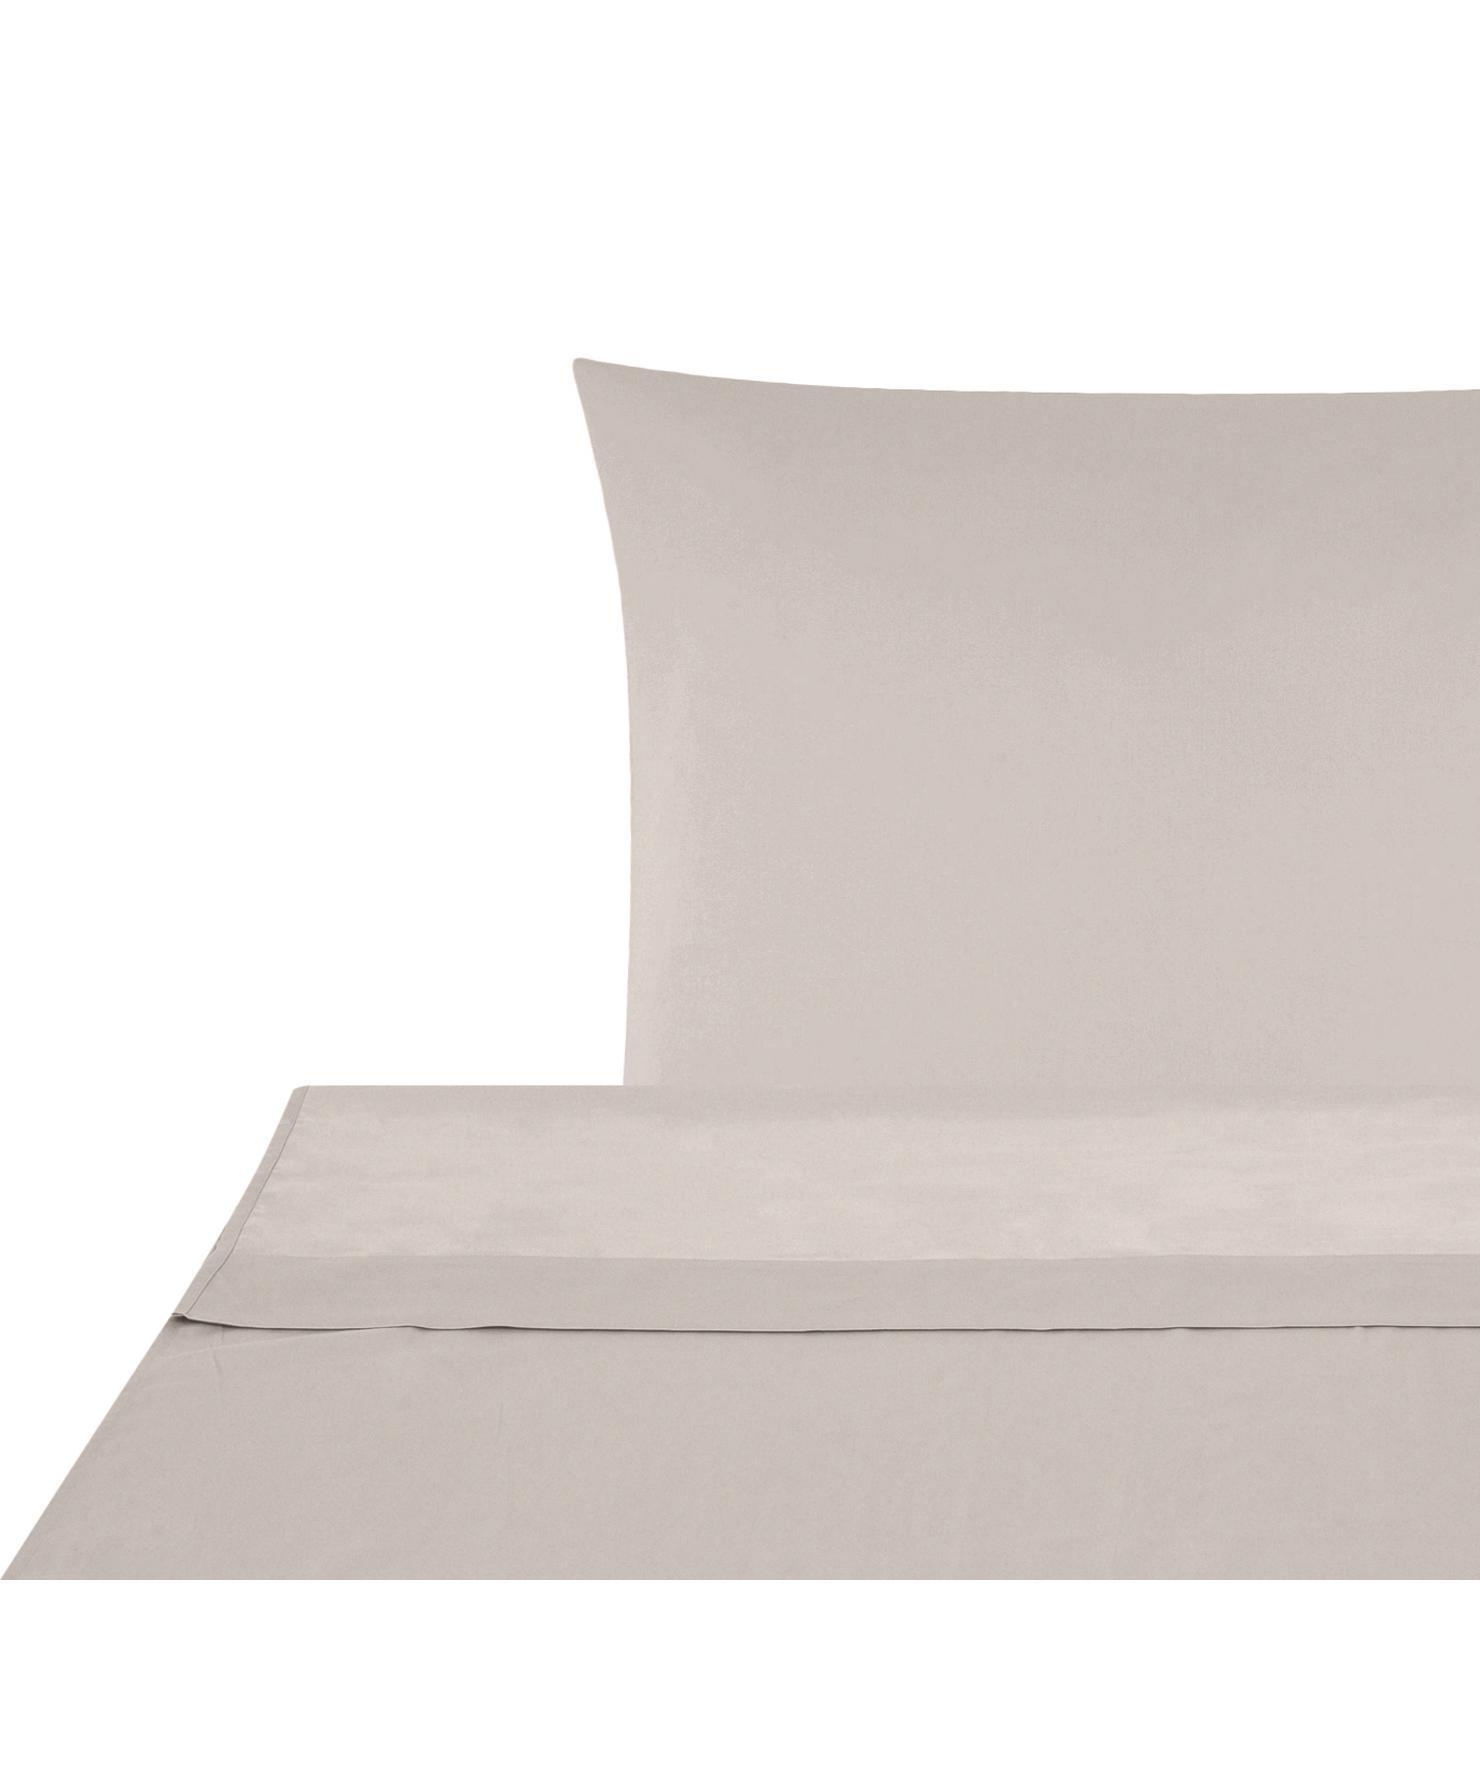 Sábana encimera de satén Comfort, Gris pardo, Cama 150/160 cm (240 x 270 cm)